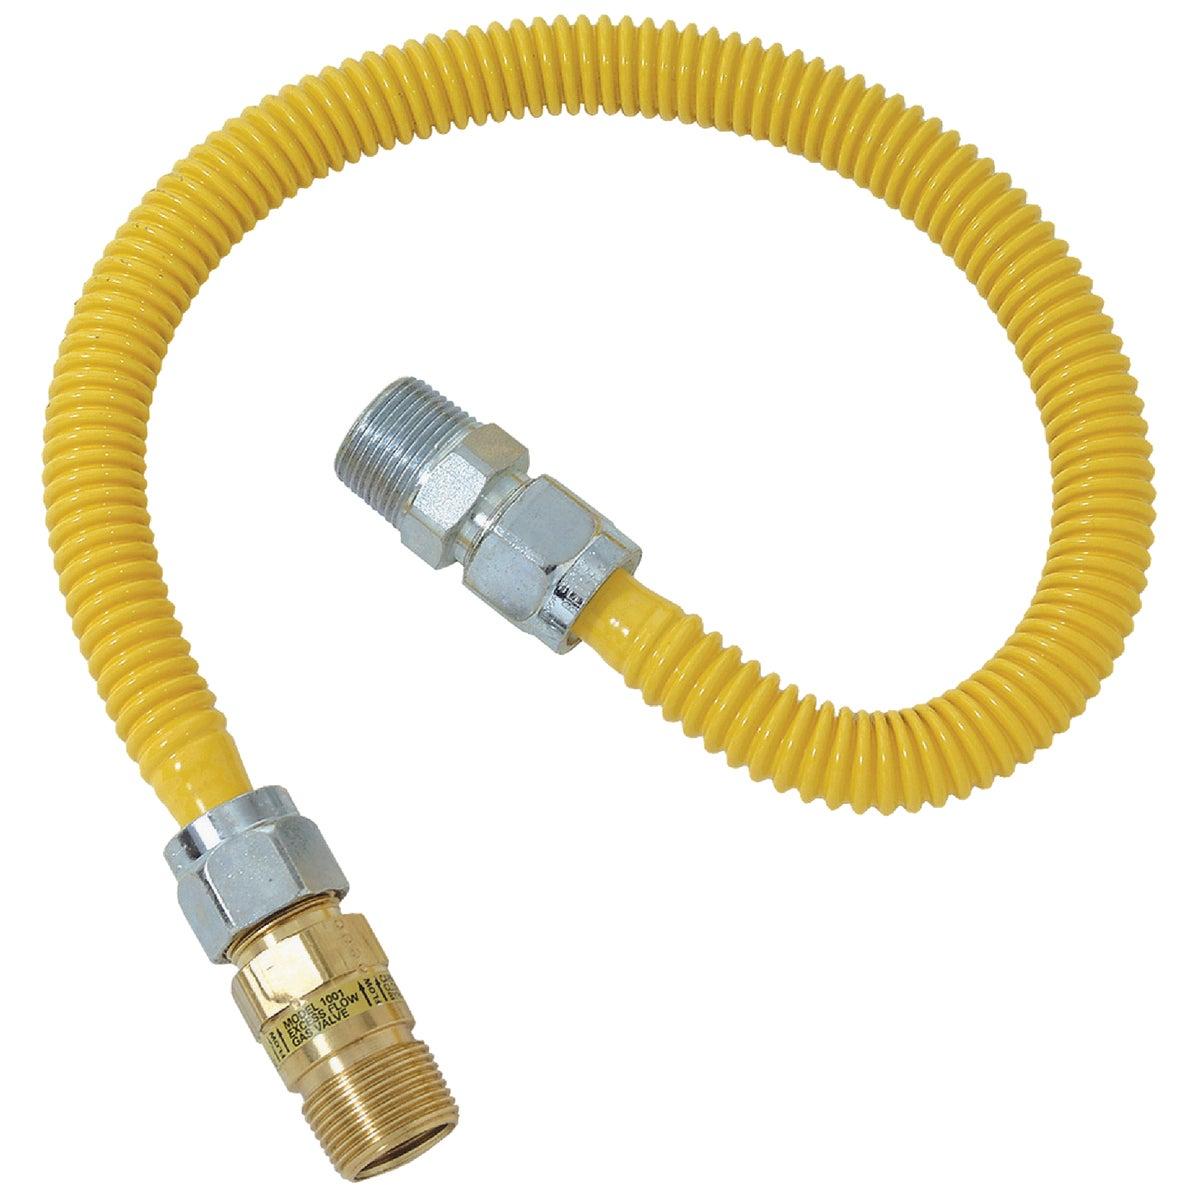 1/2X1/2-24 GAS CONNECTOR